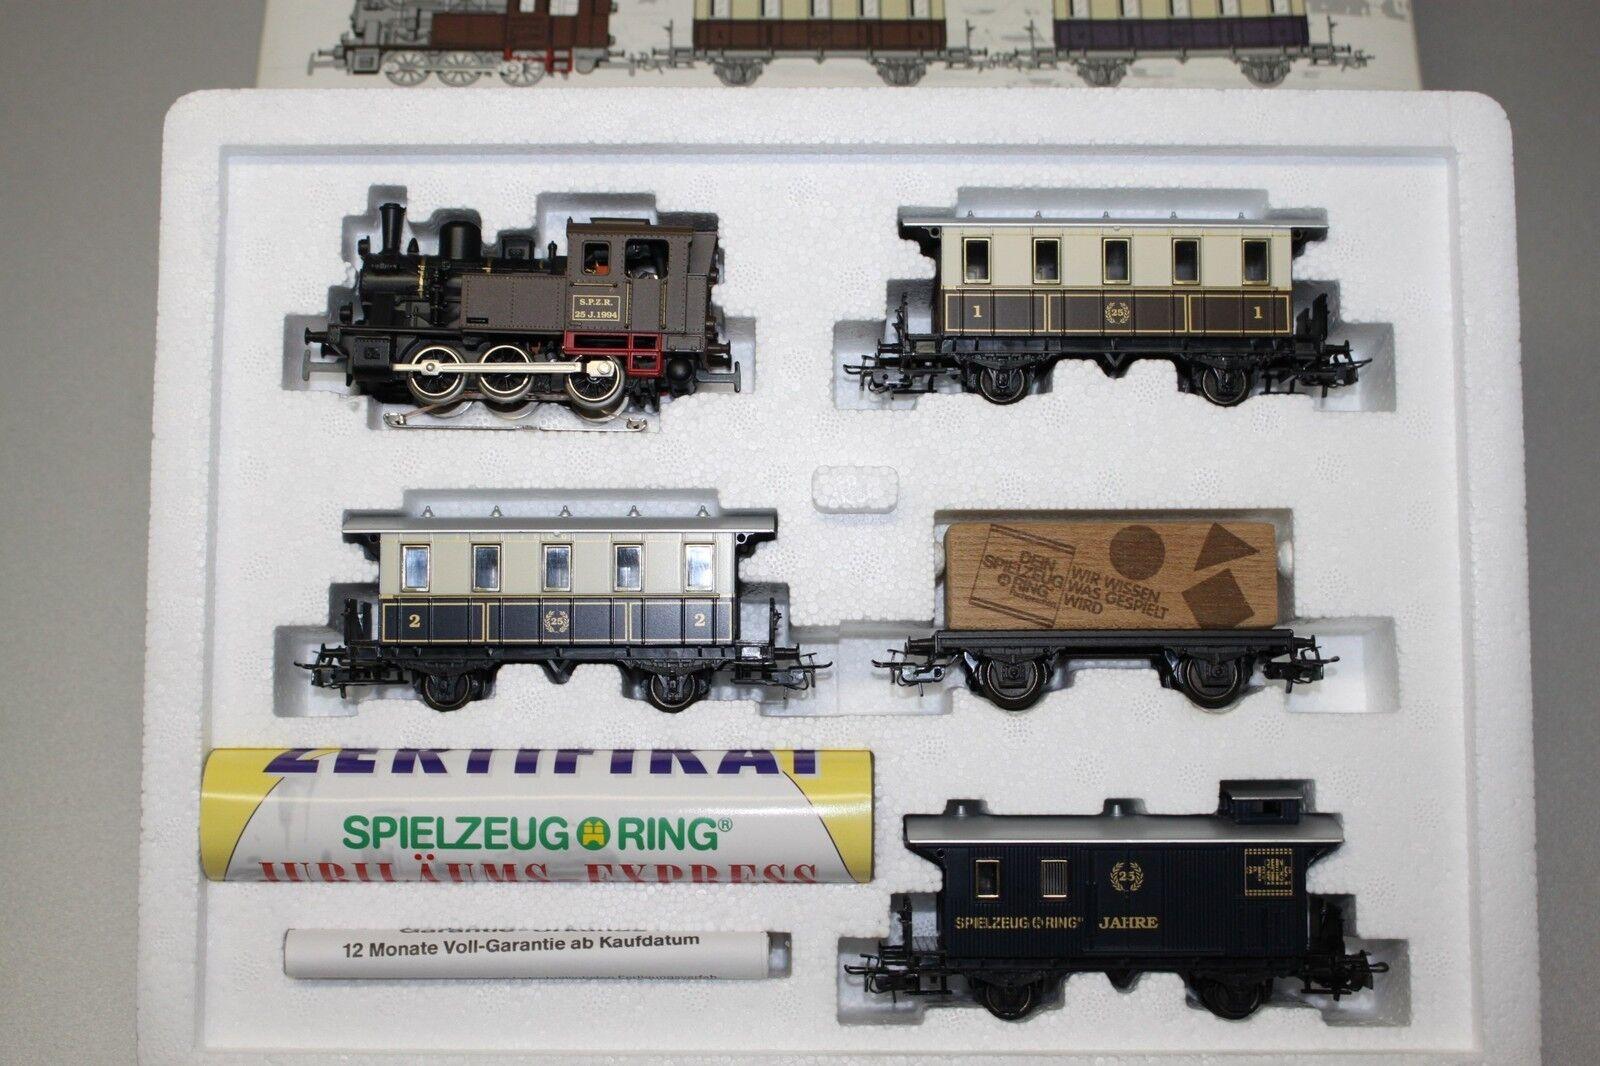 Märklin 2840 Zug-Set Spielzeugring mit Dampflok Spur H0 OVP